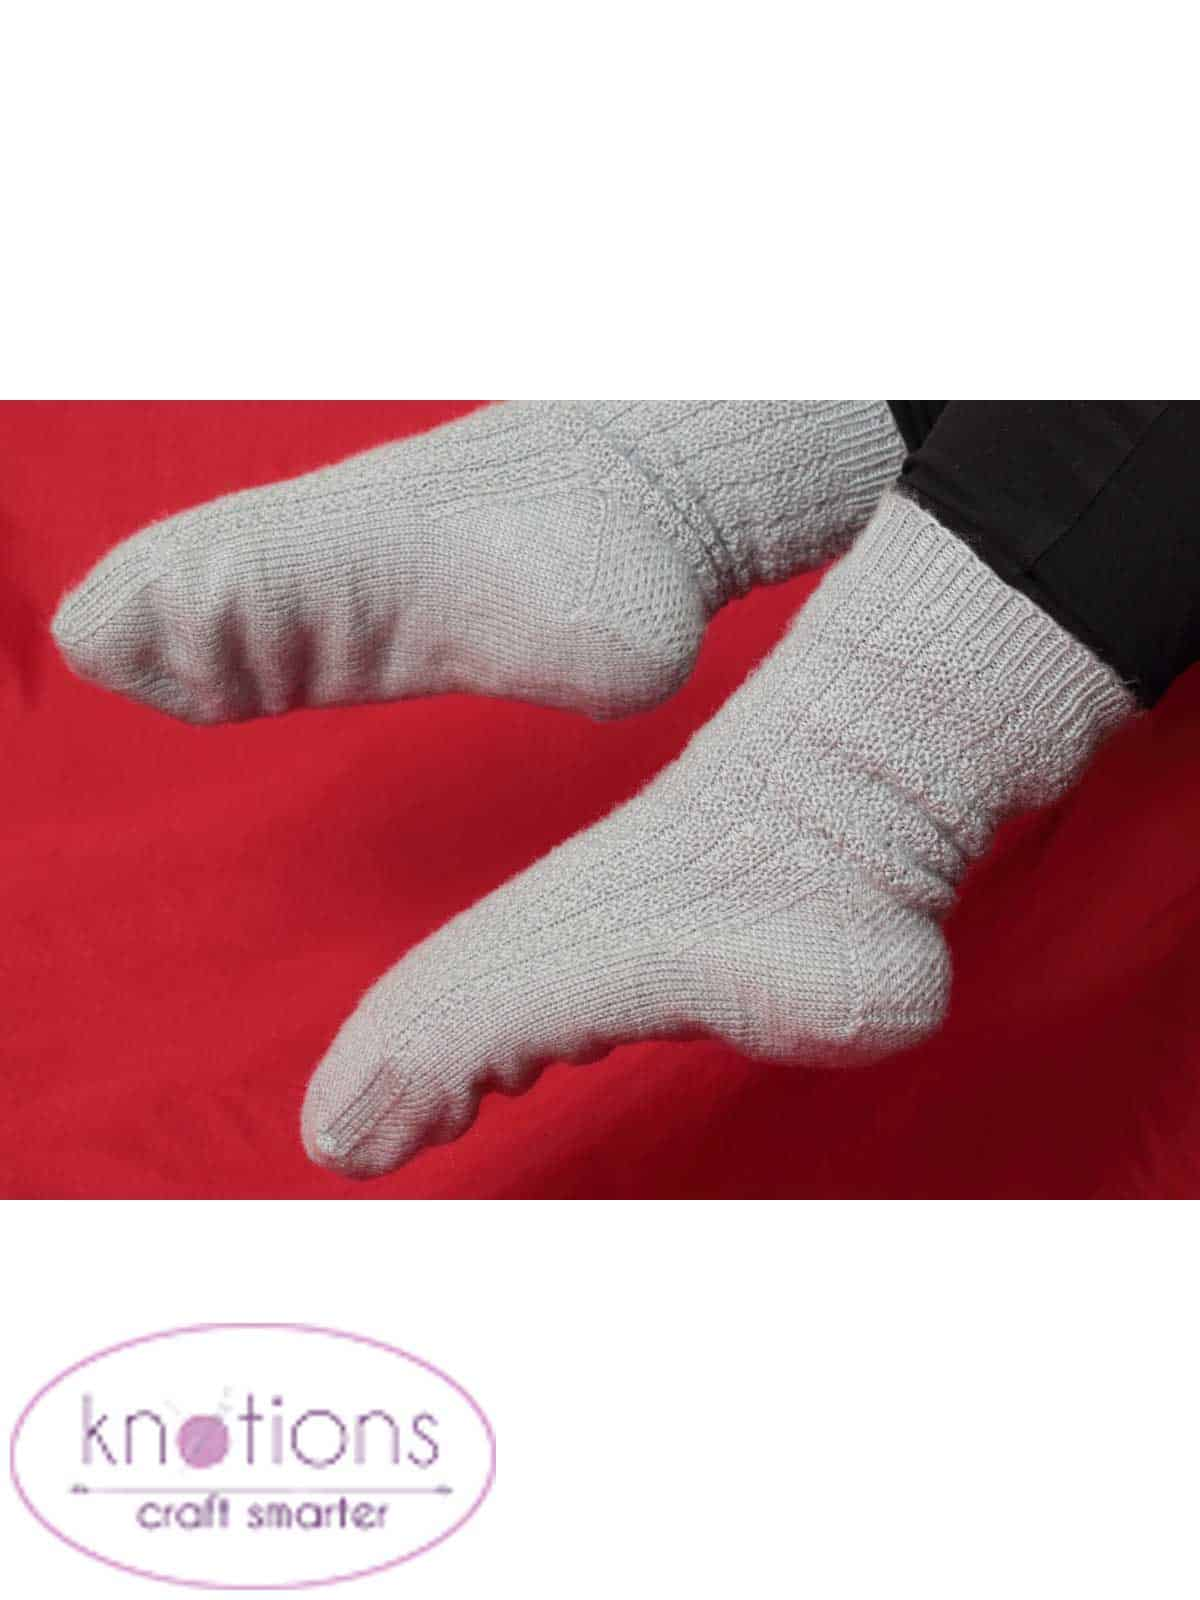 unassuming-socks-4